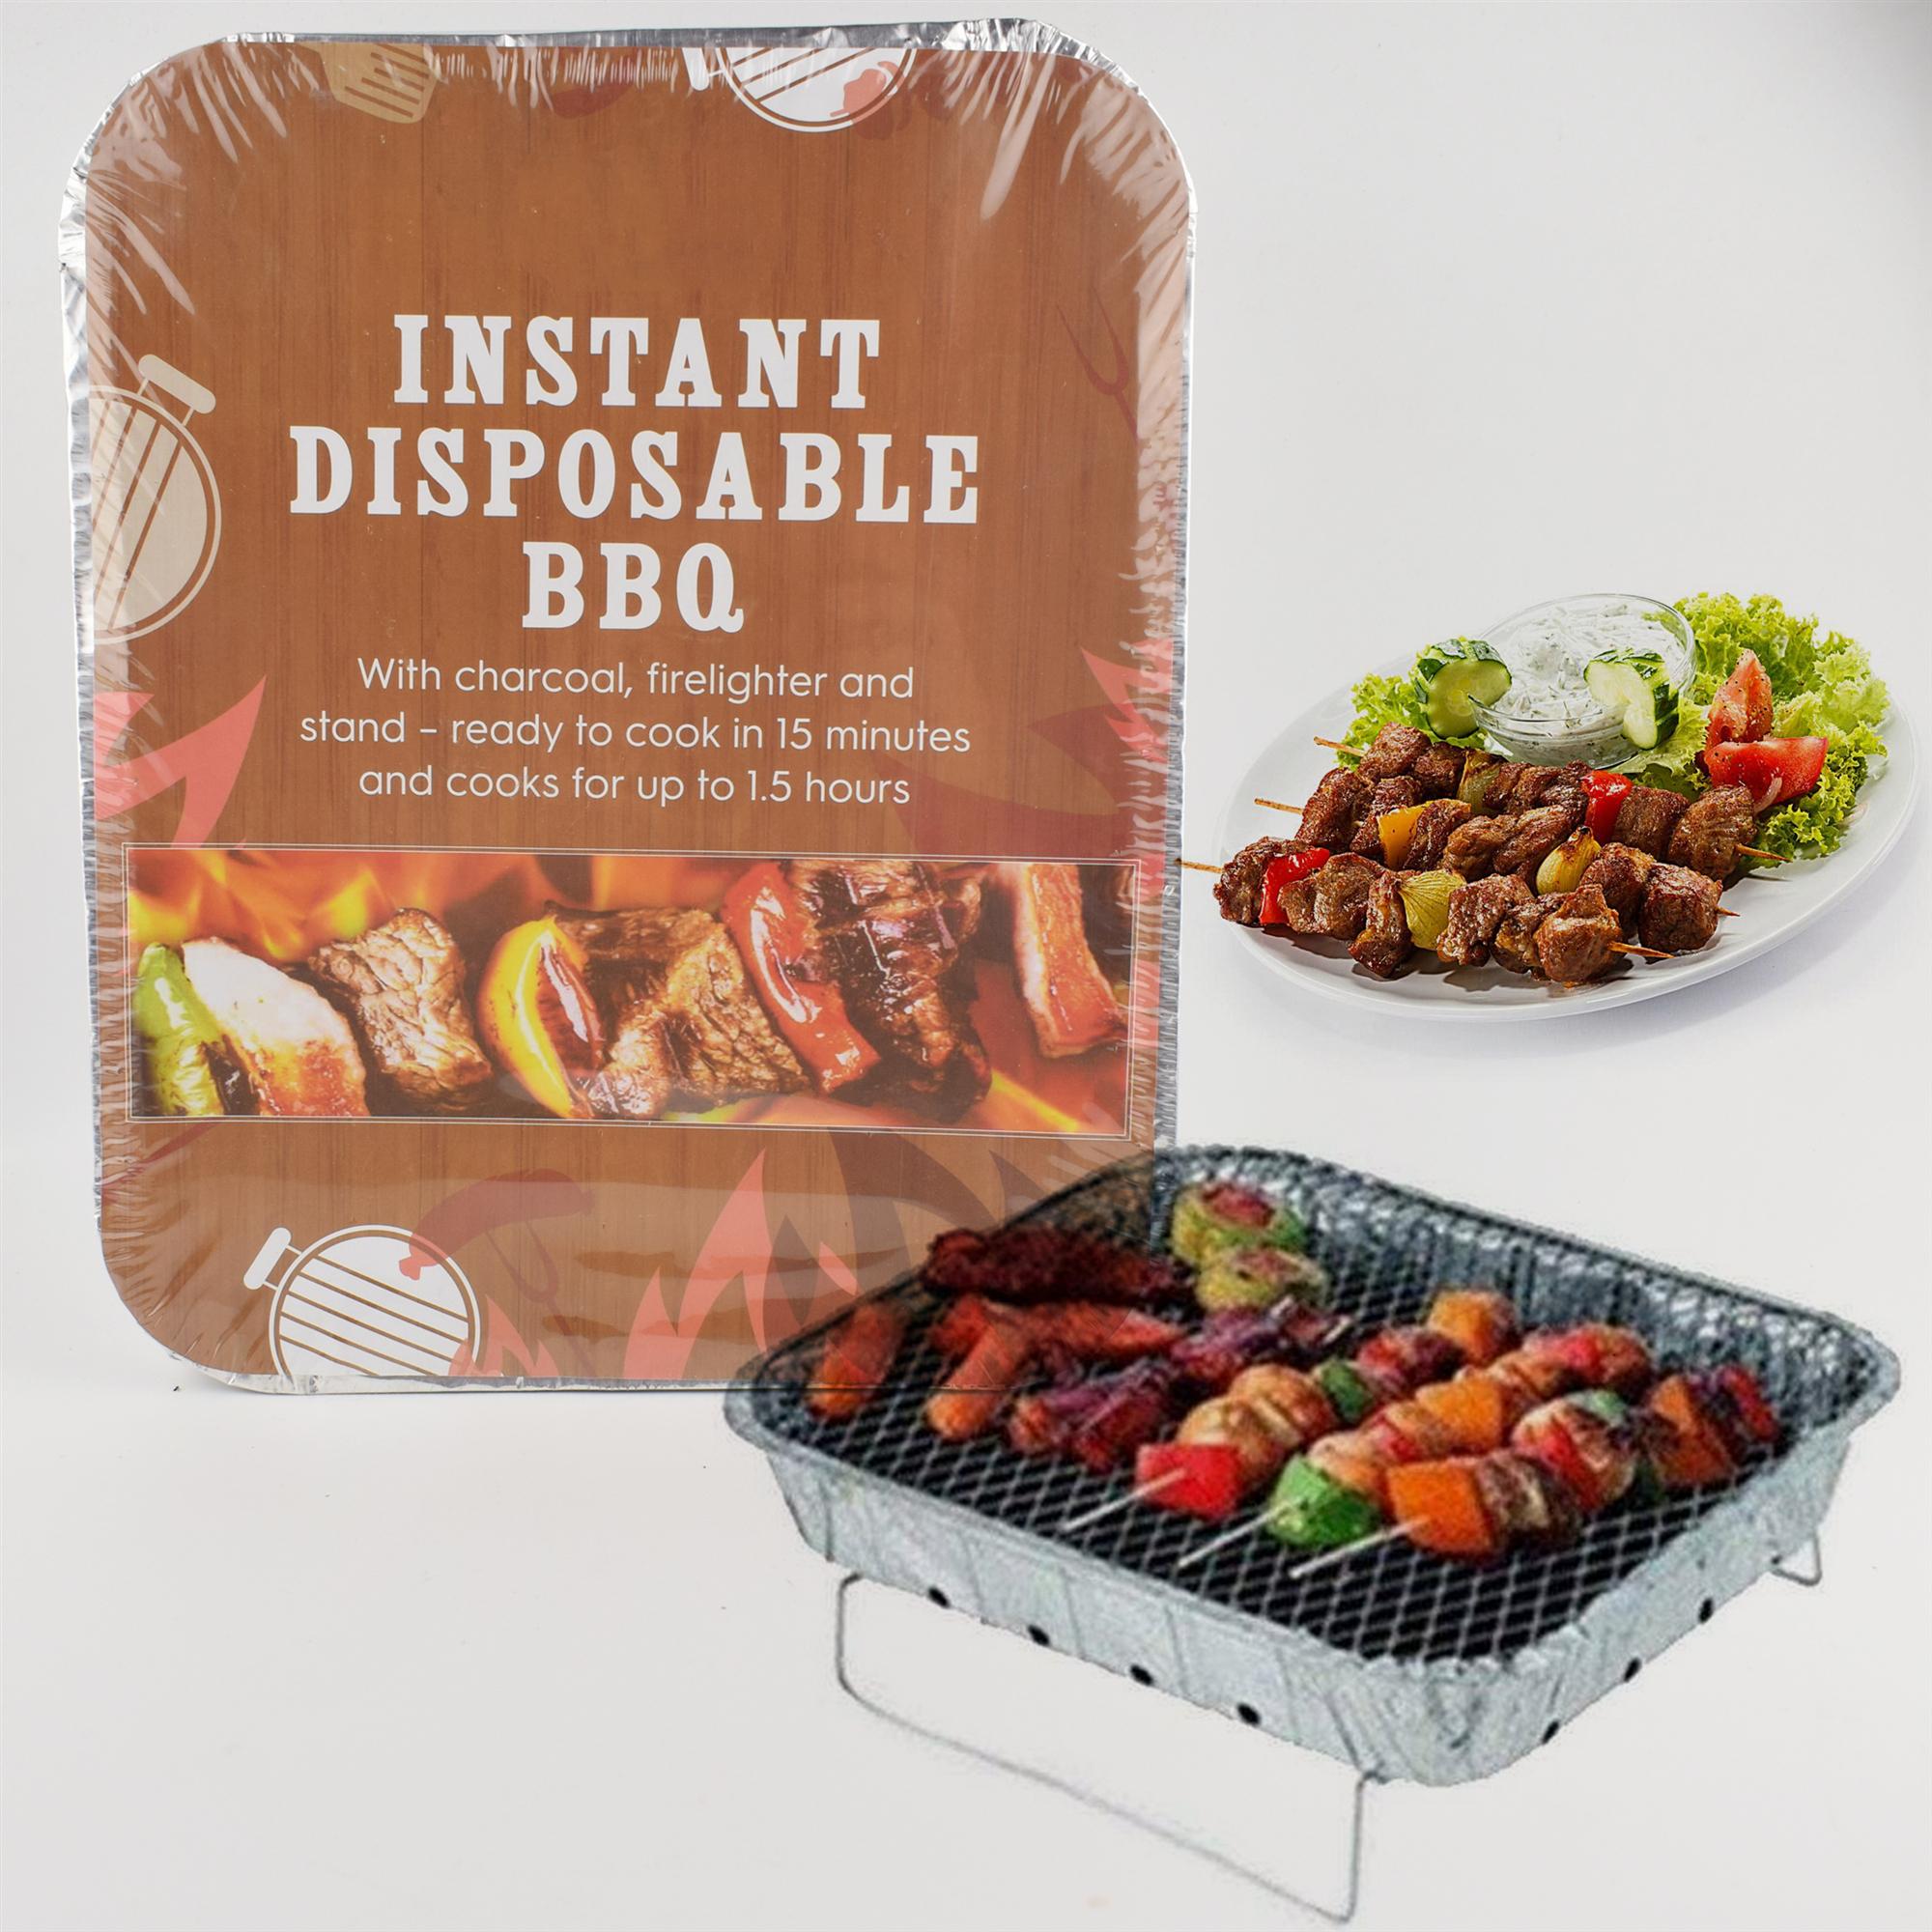 Barbecue Barbecue outils de jardin en plein air camping pique-nique sans fumée casserole en aluminium jetable instantanée Barbecue Barbecue au charbon de bois